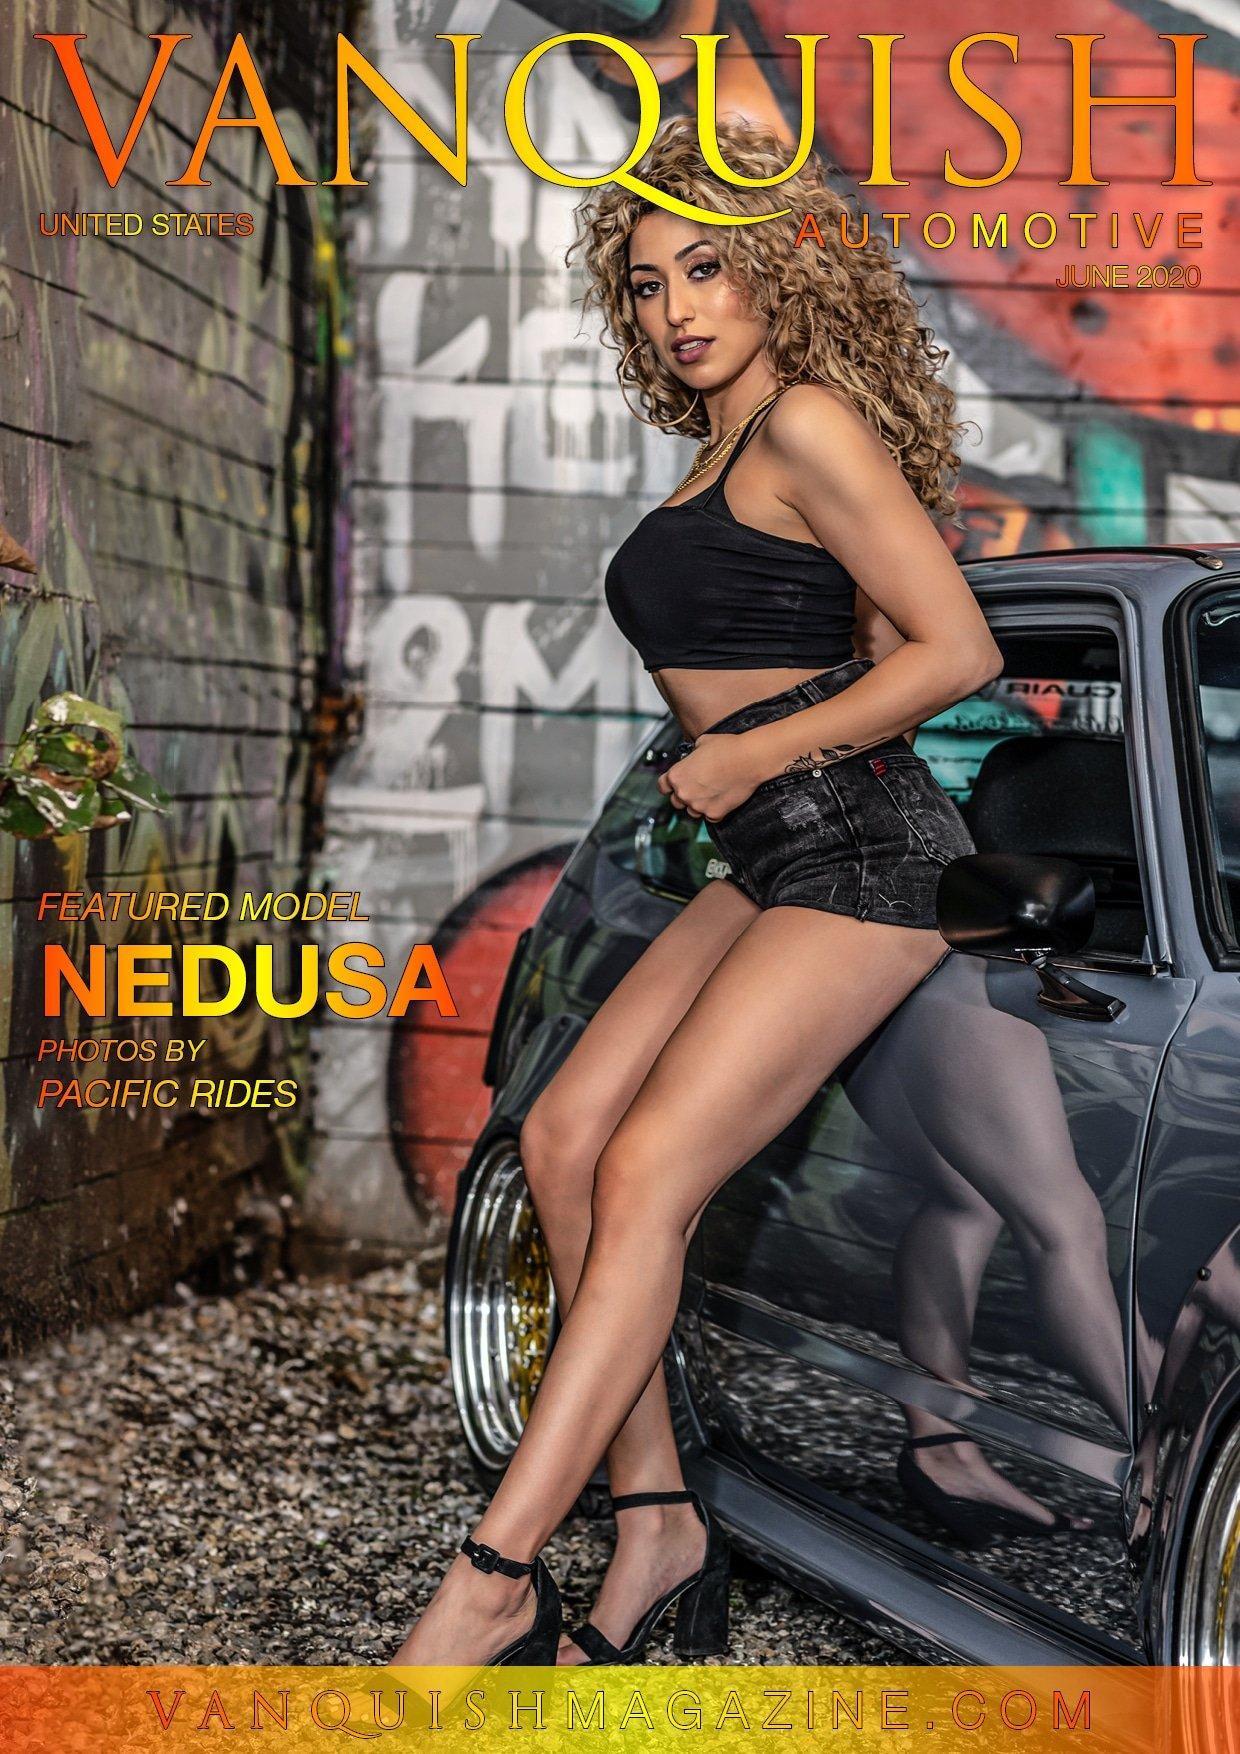 Vanquish Automotive - June 2020 - Nedusa